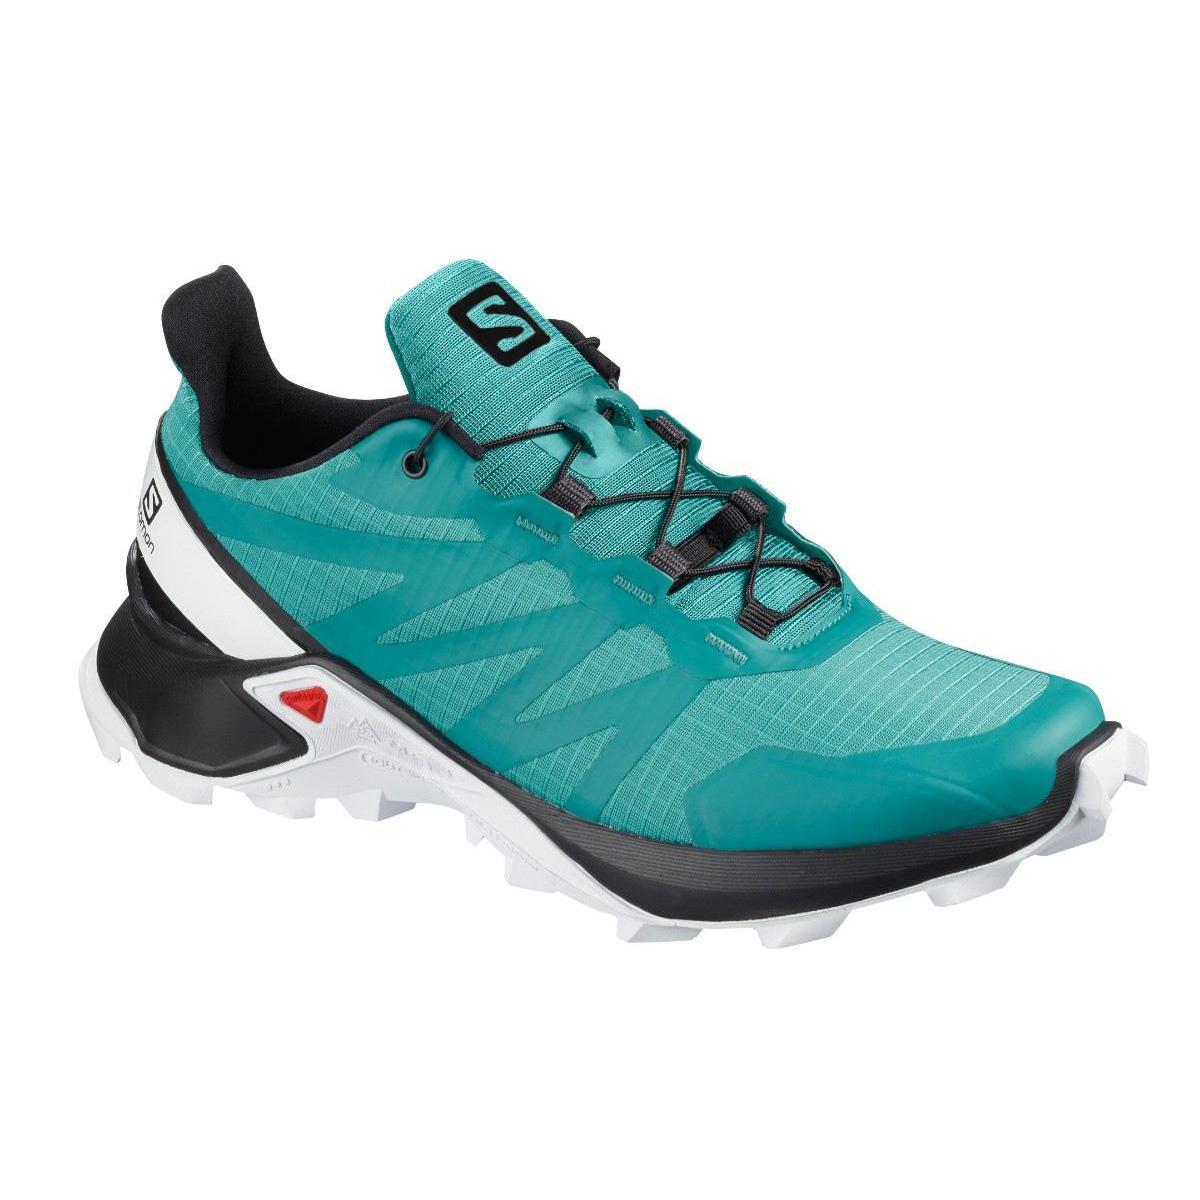 Pantofi alergare Salomon SUPERCROSS W - Albastru